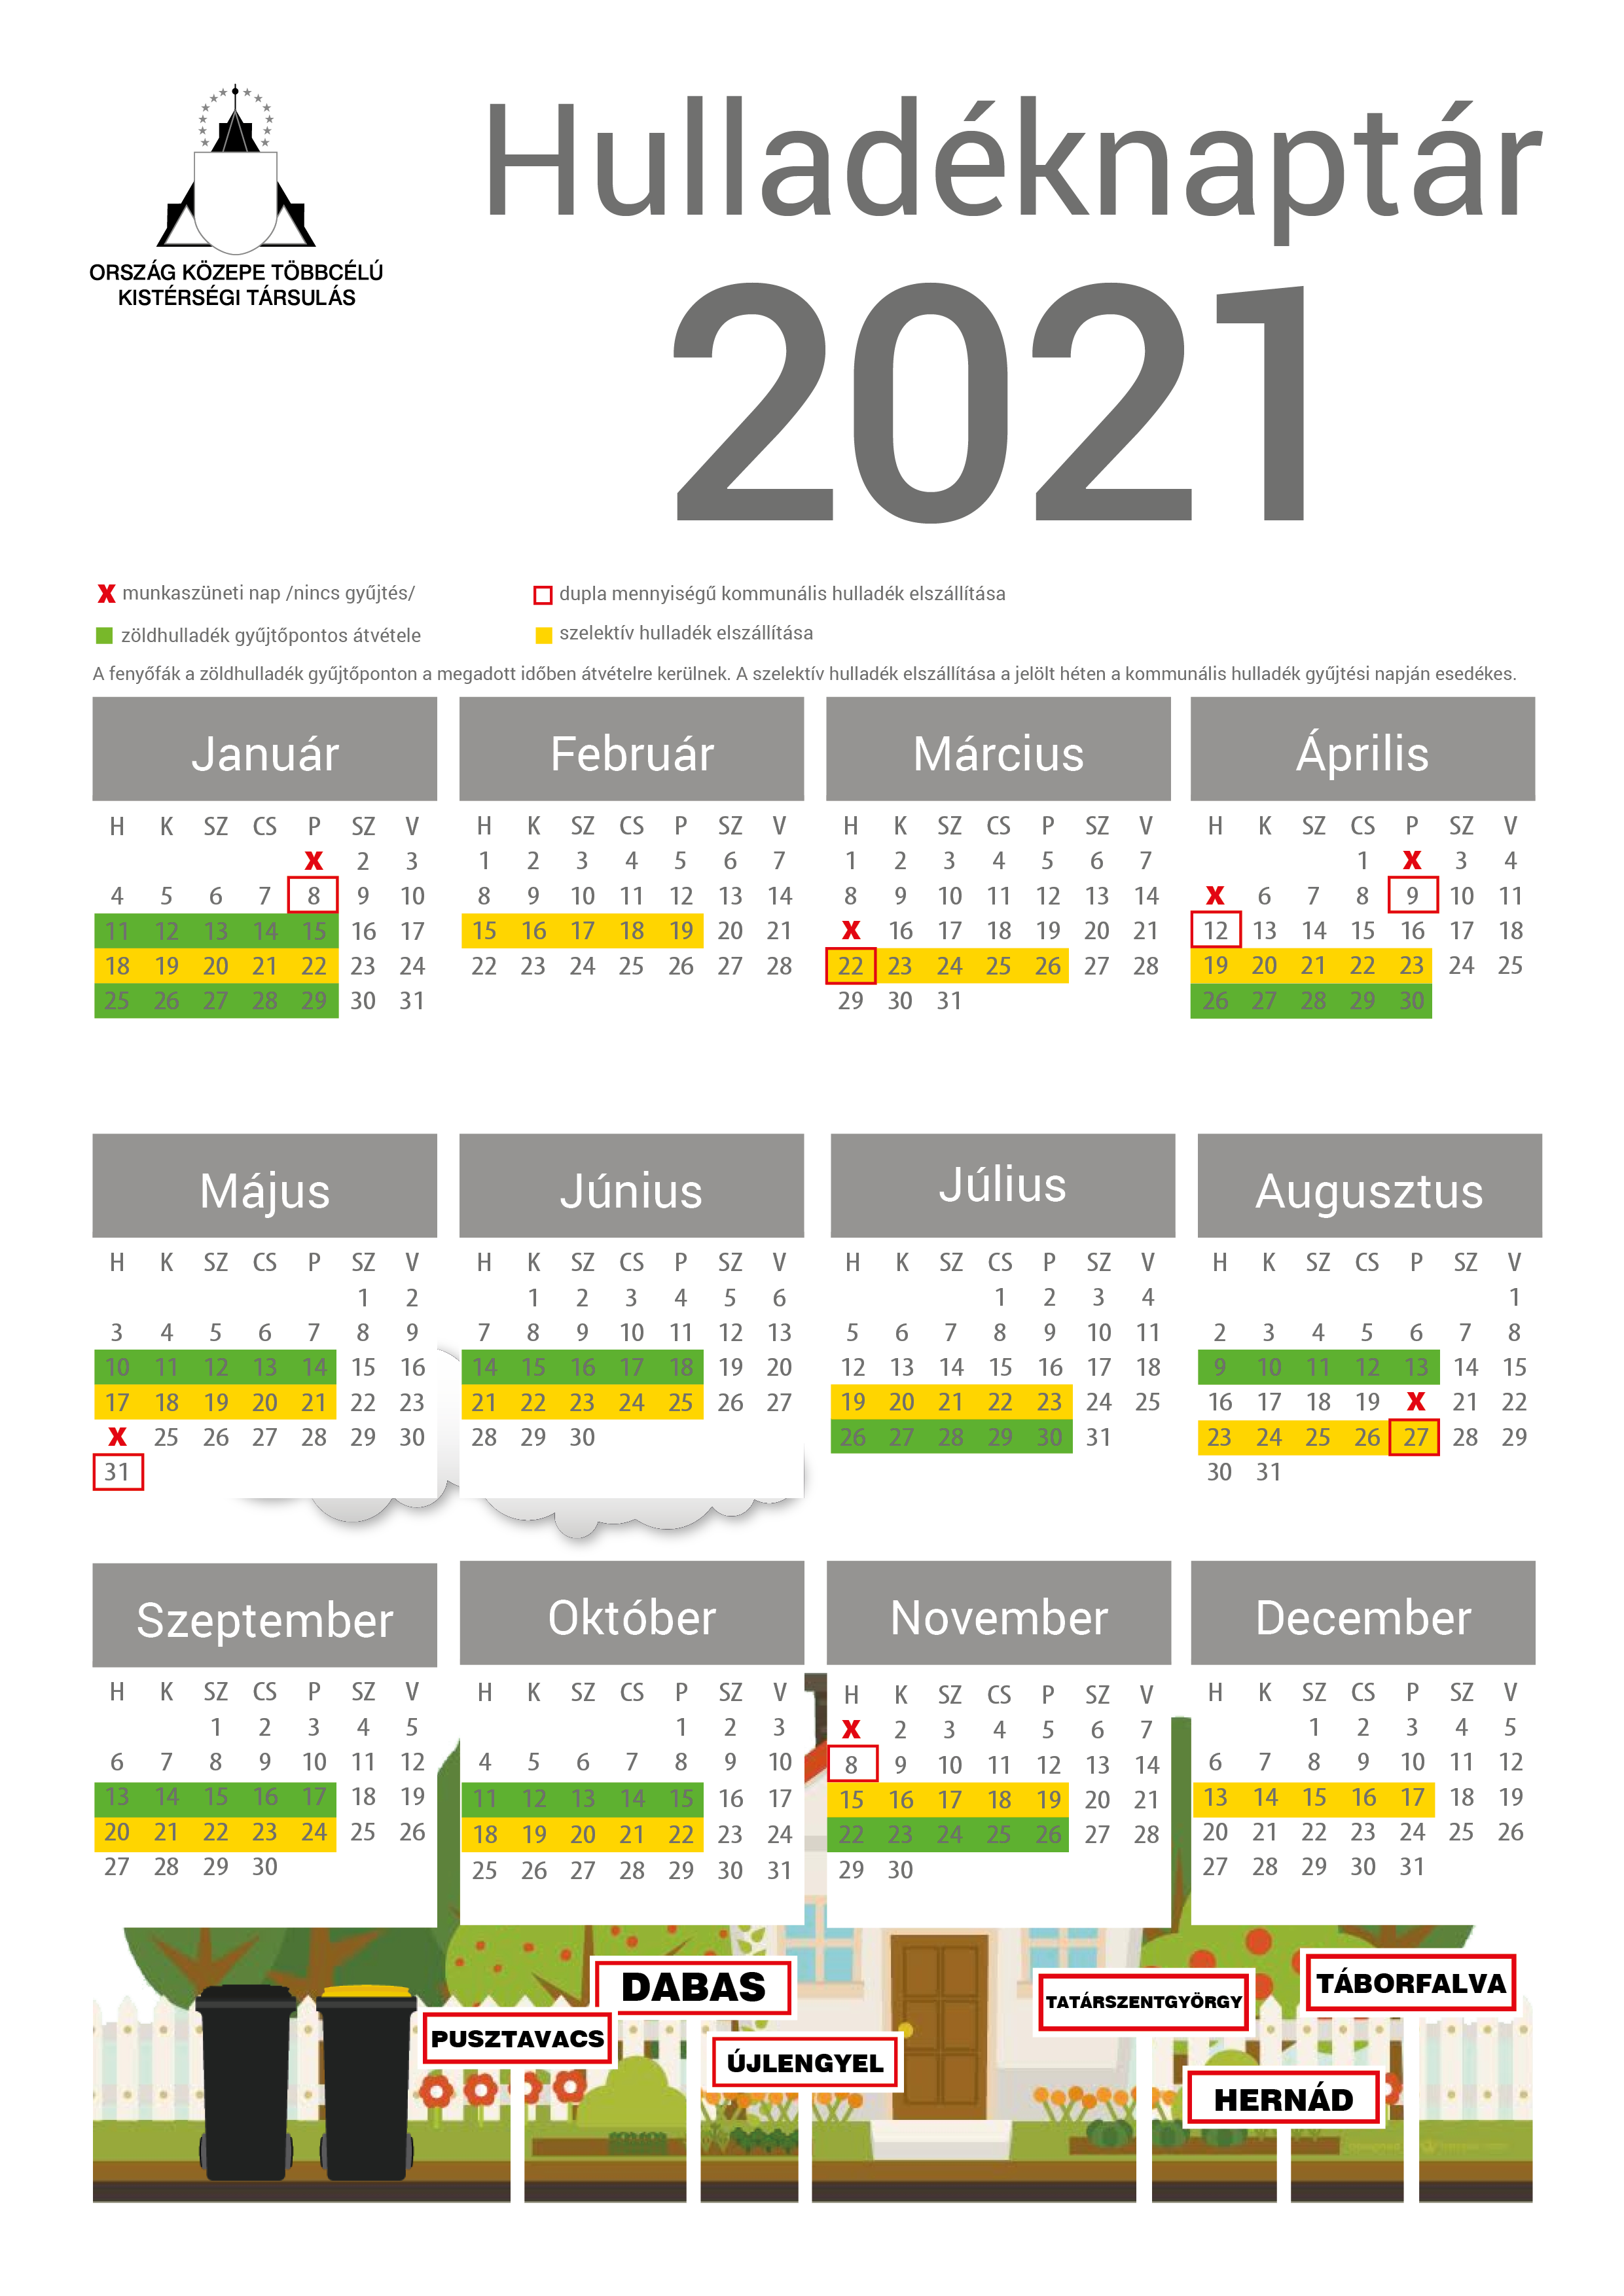 Hulladéknaptár 2021